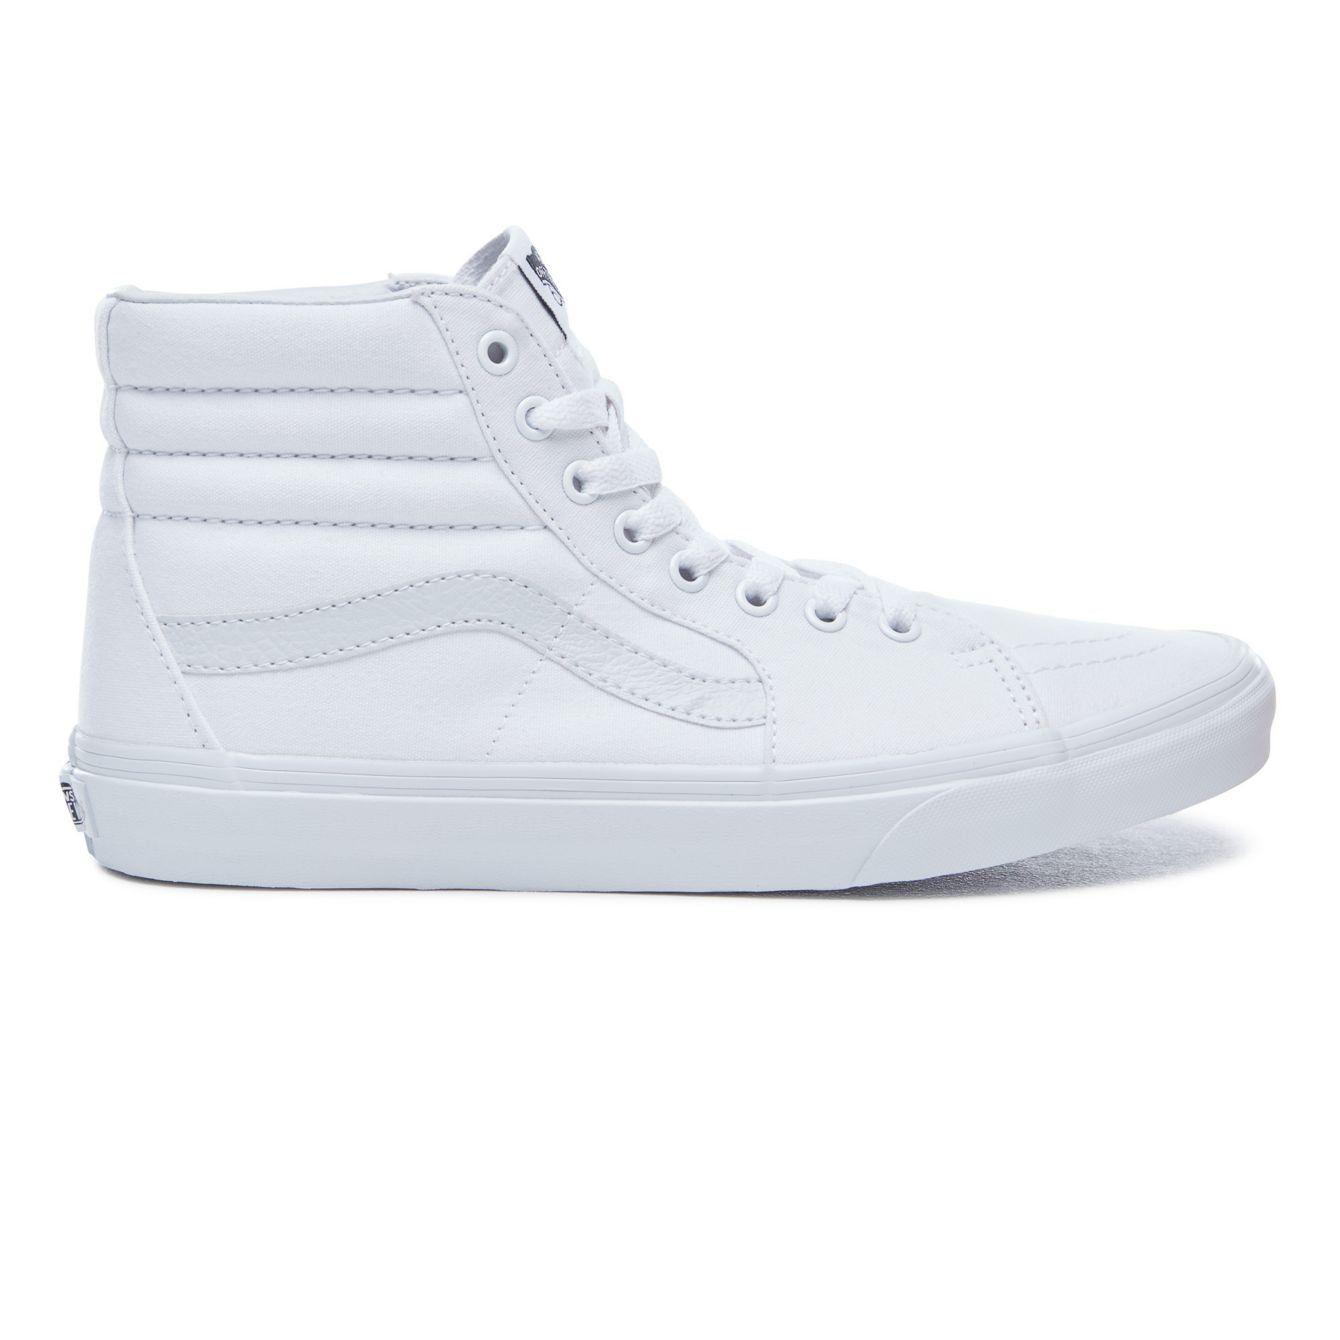 Vans Sk8-Hi True White Shoes | Chaussure, Acheter chaussures ...